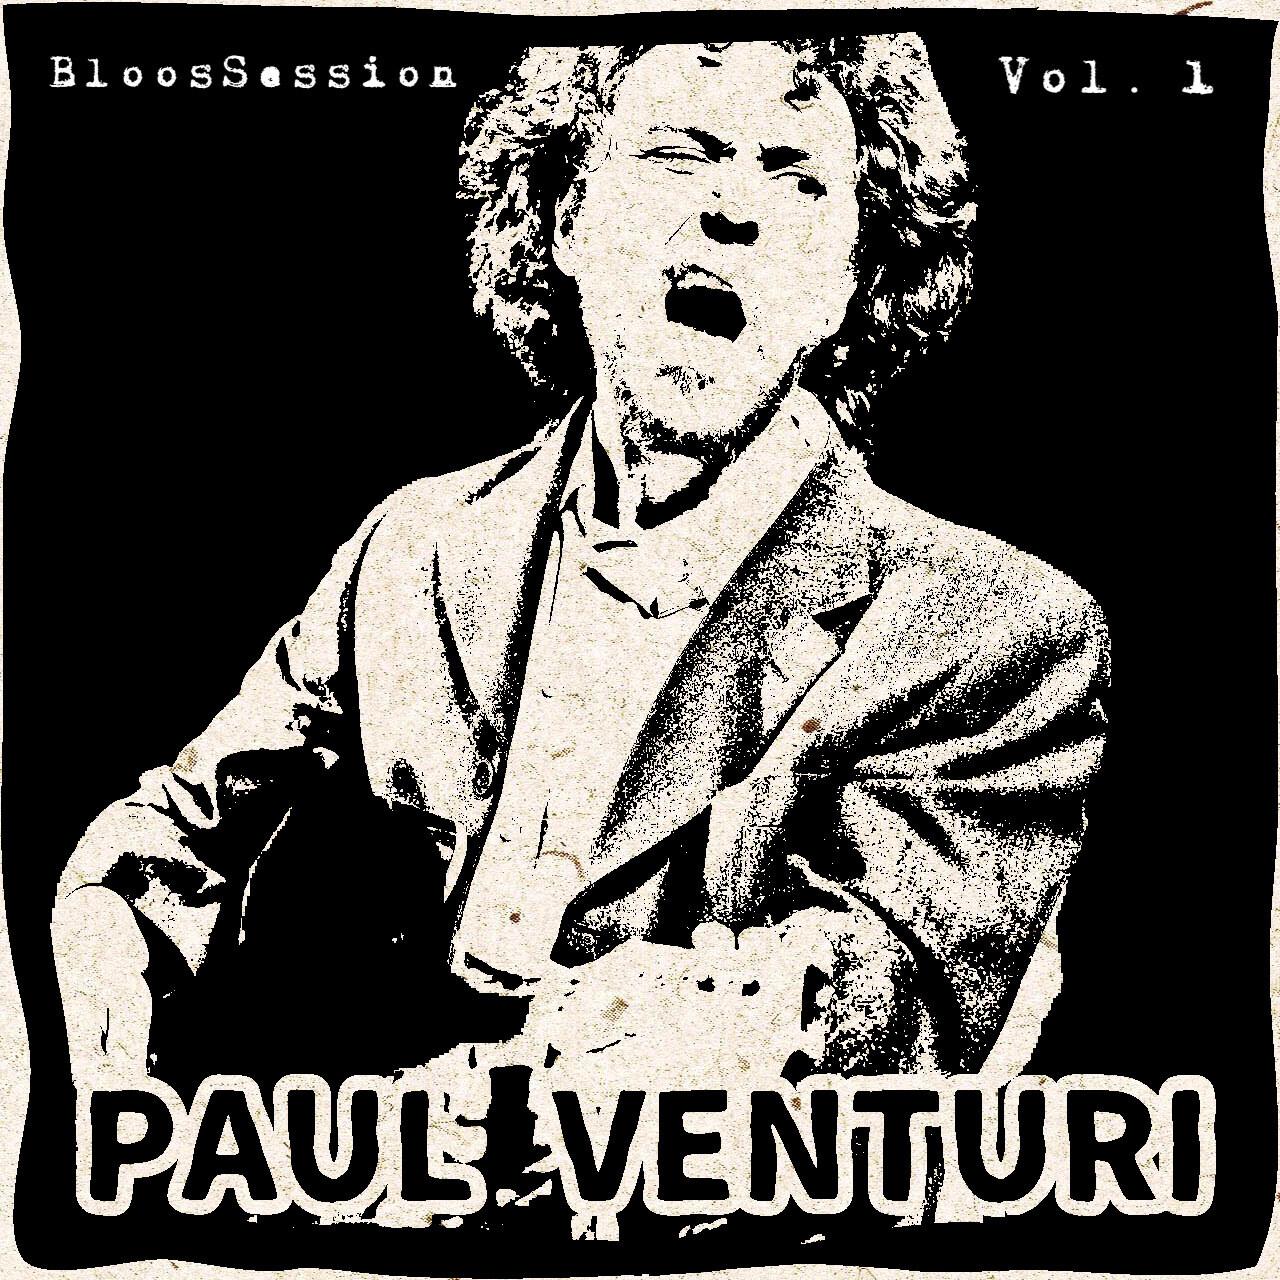 Bloossession Vol.1 - PAUL VENTURI (CD) Super Limited (50)